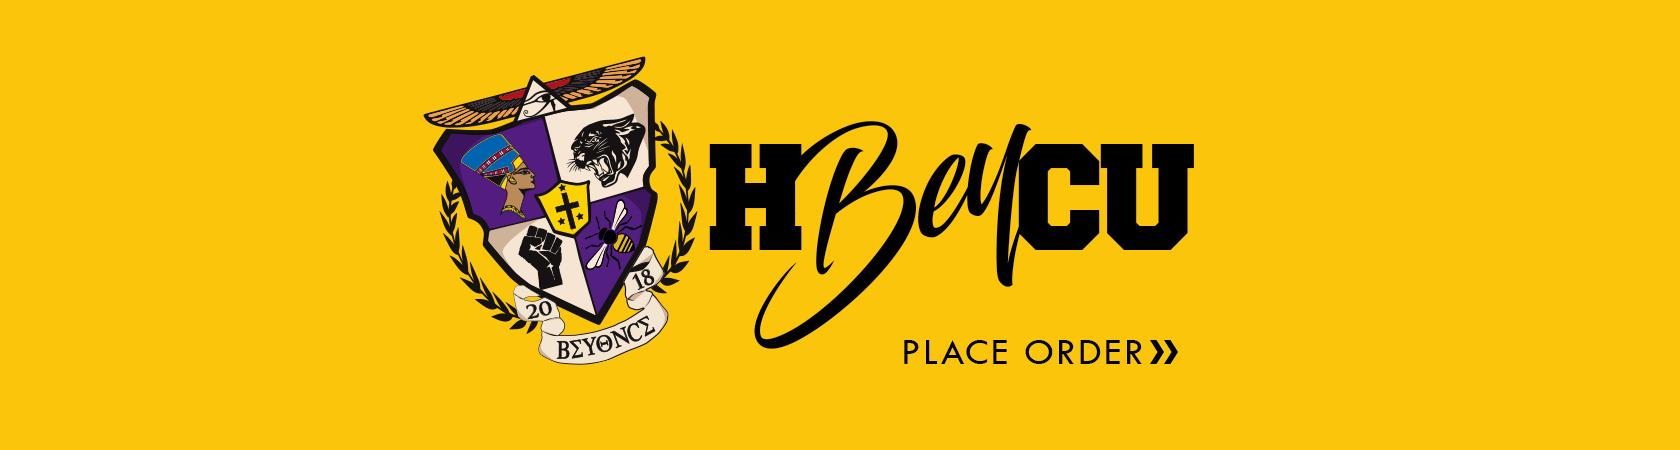 Place Order Banner -  Beta Delta Kappa Shield Design